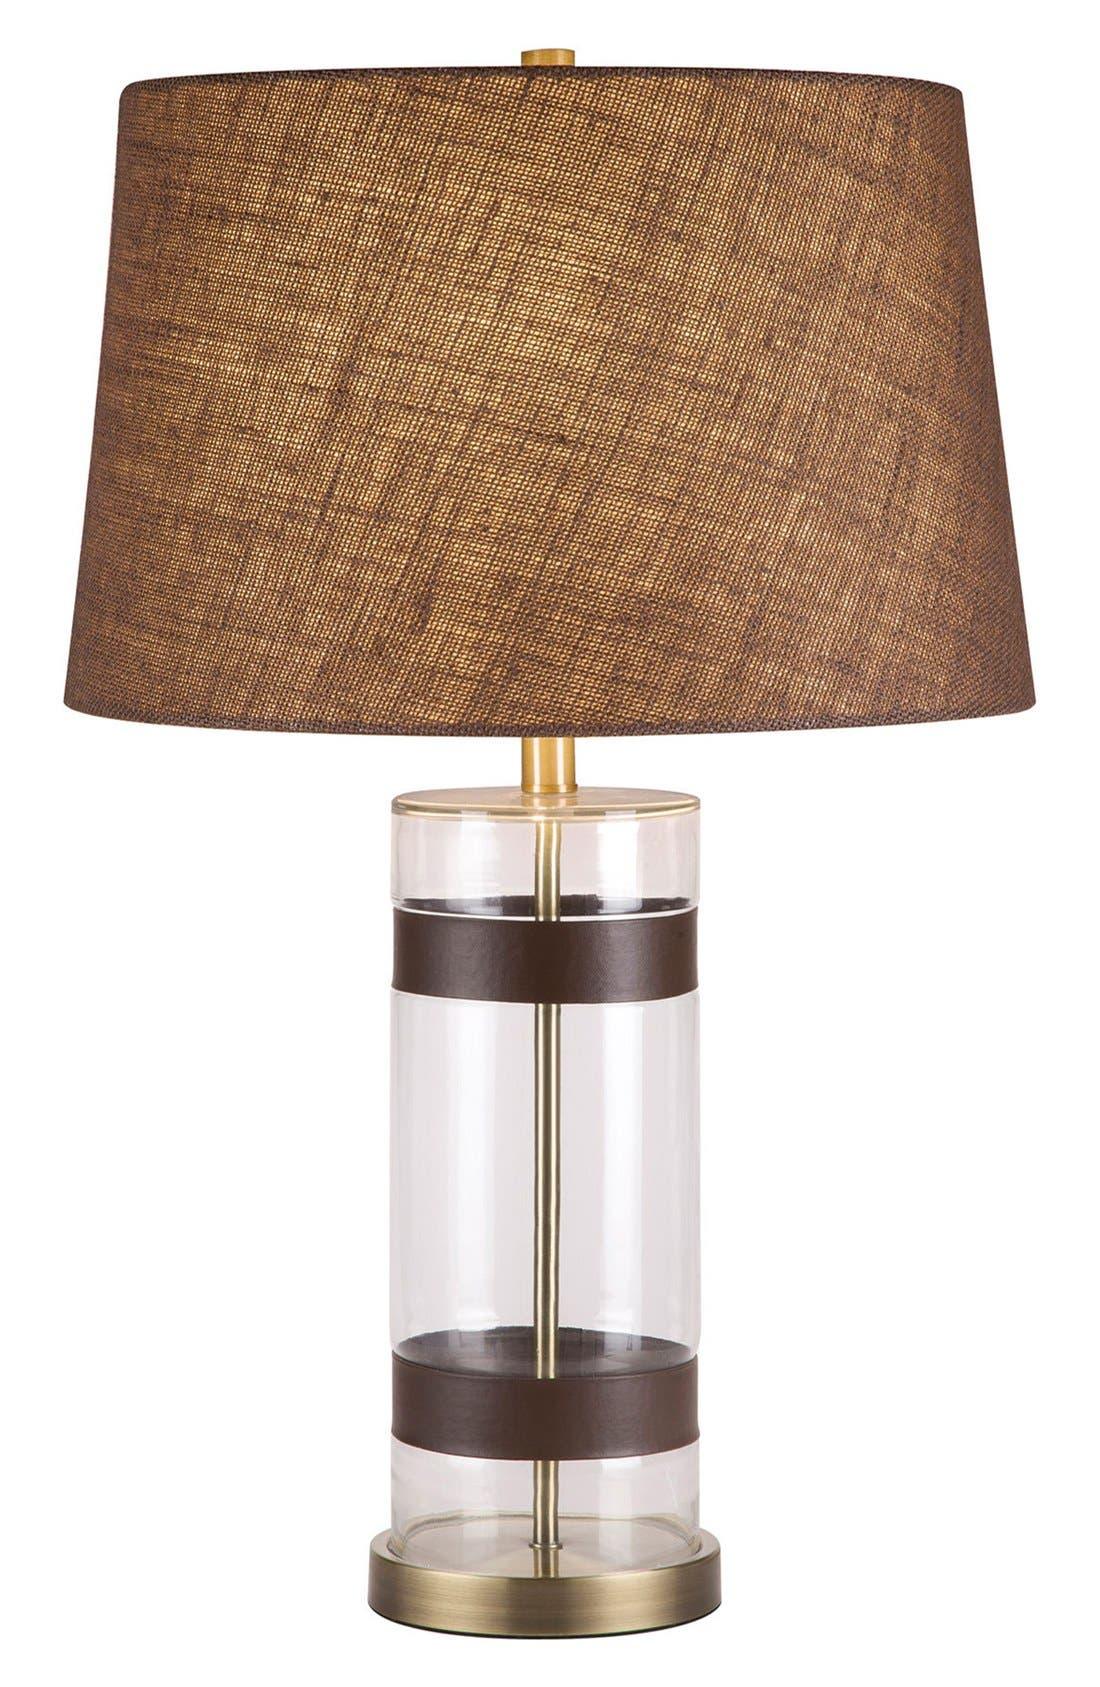 JAlexander Glass & Faux Leather Table Lamp,                             Main thumbnail 1, color,                             100